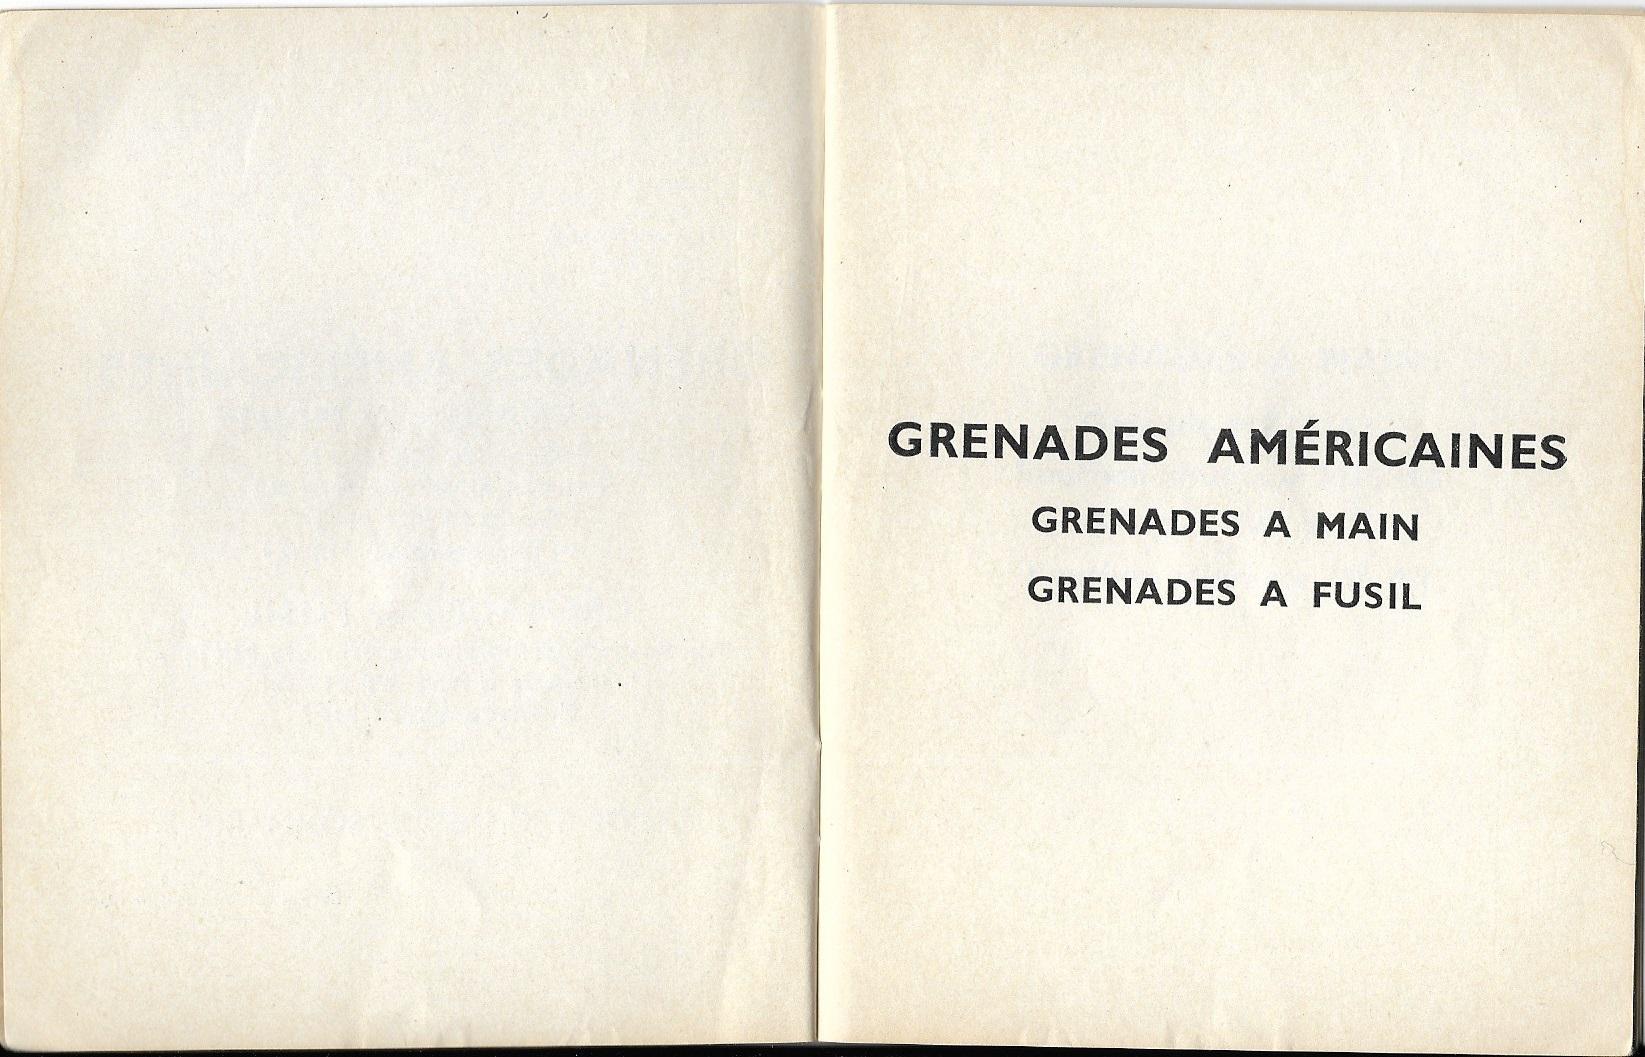 Grenades americaines 2